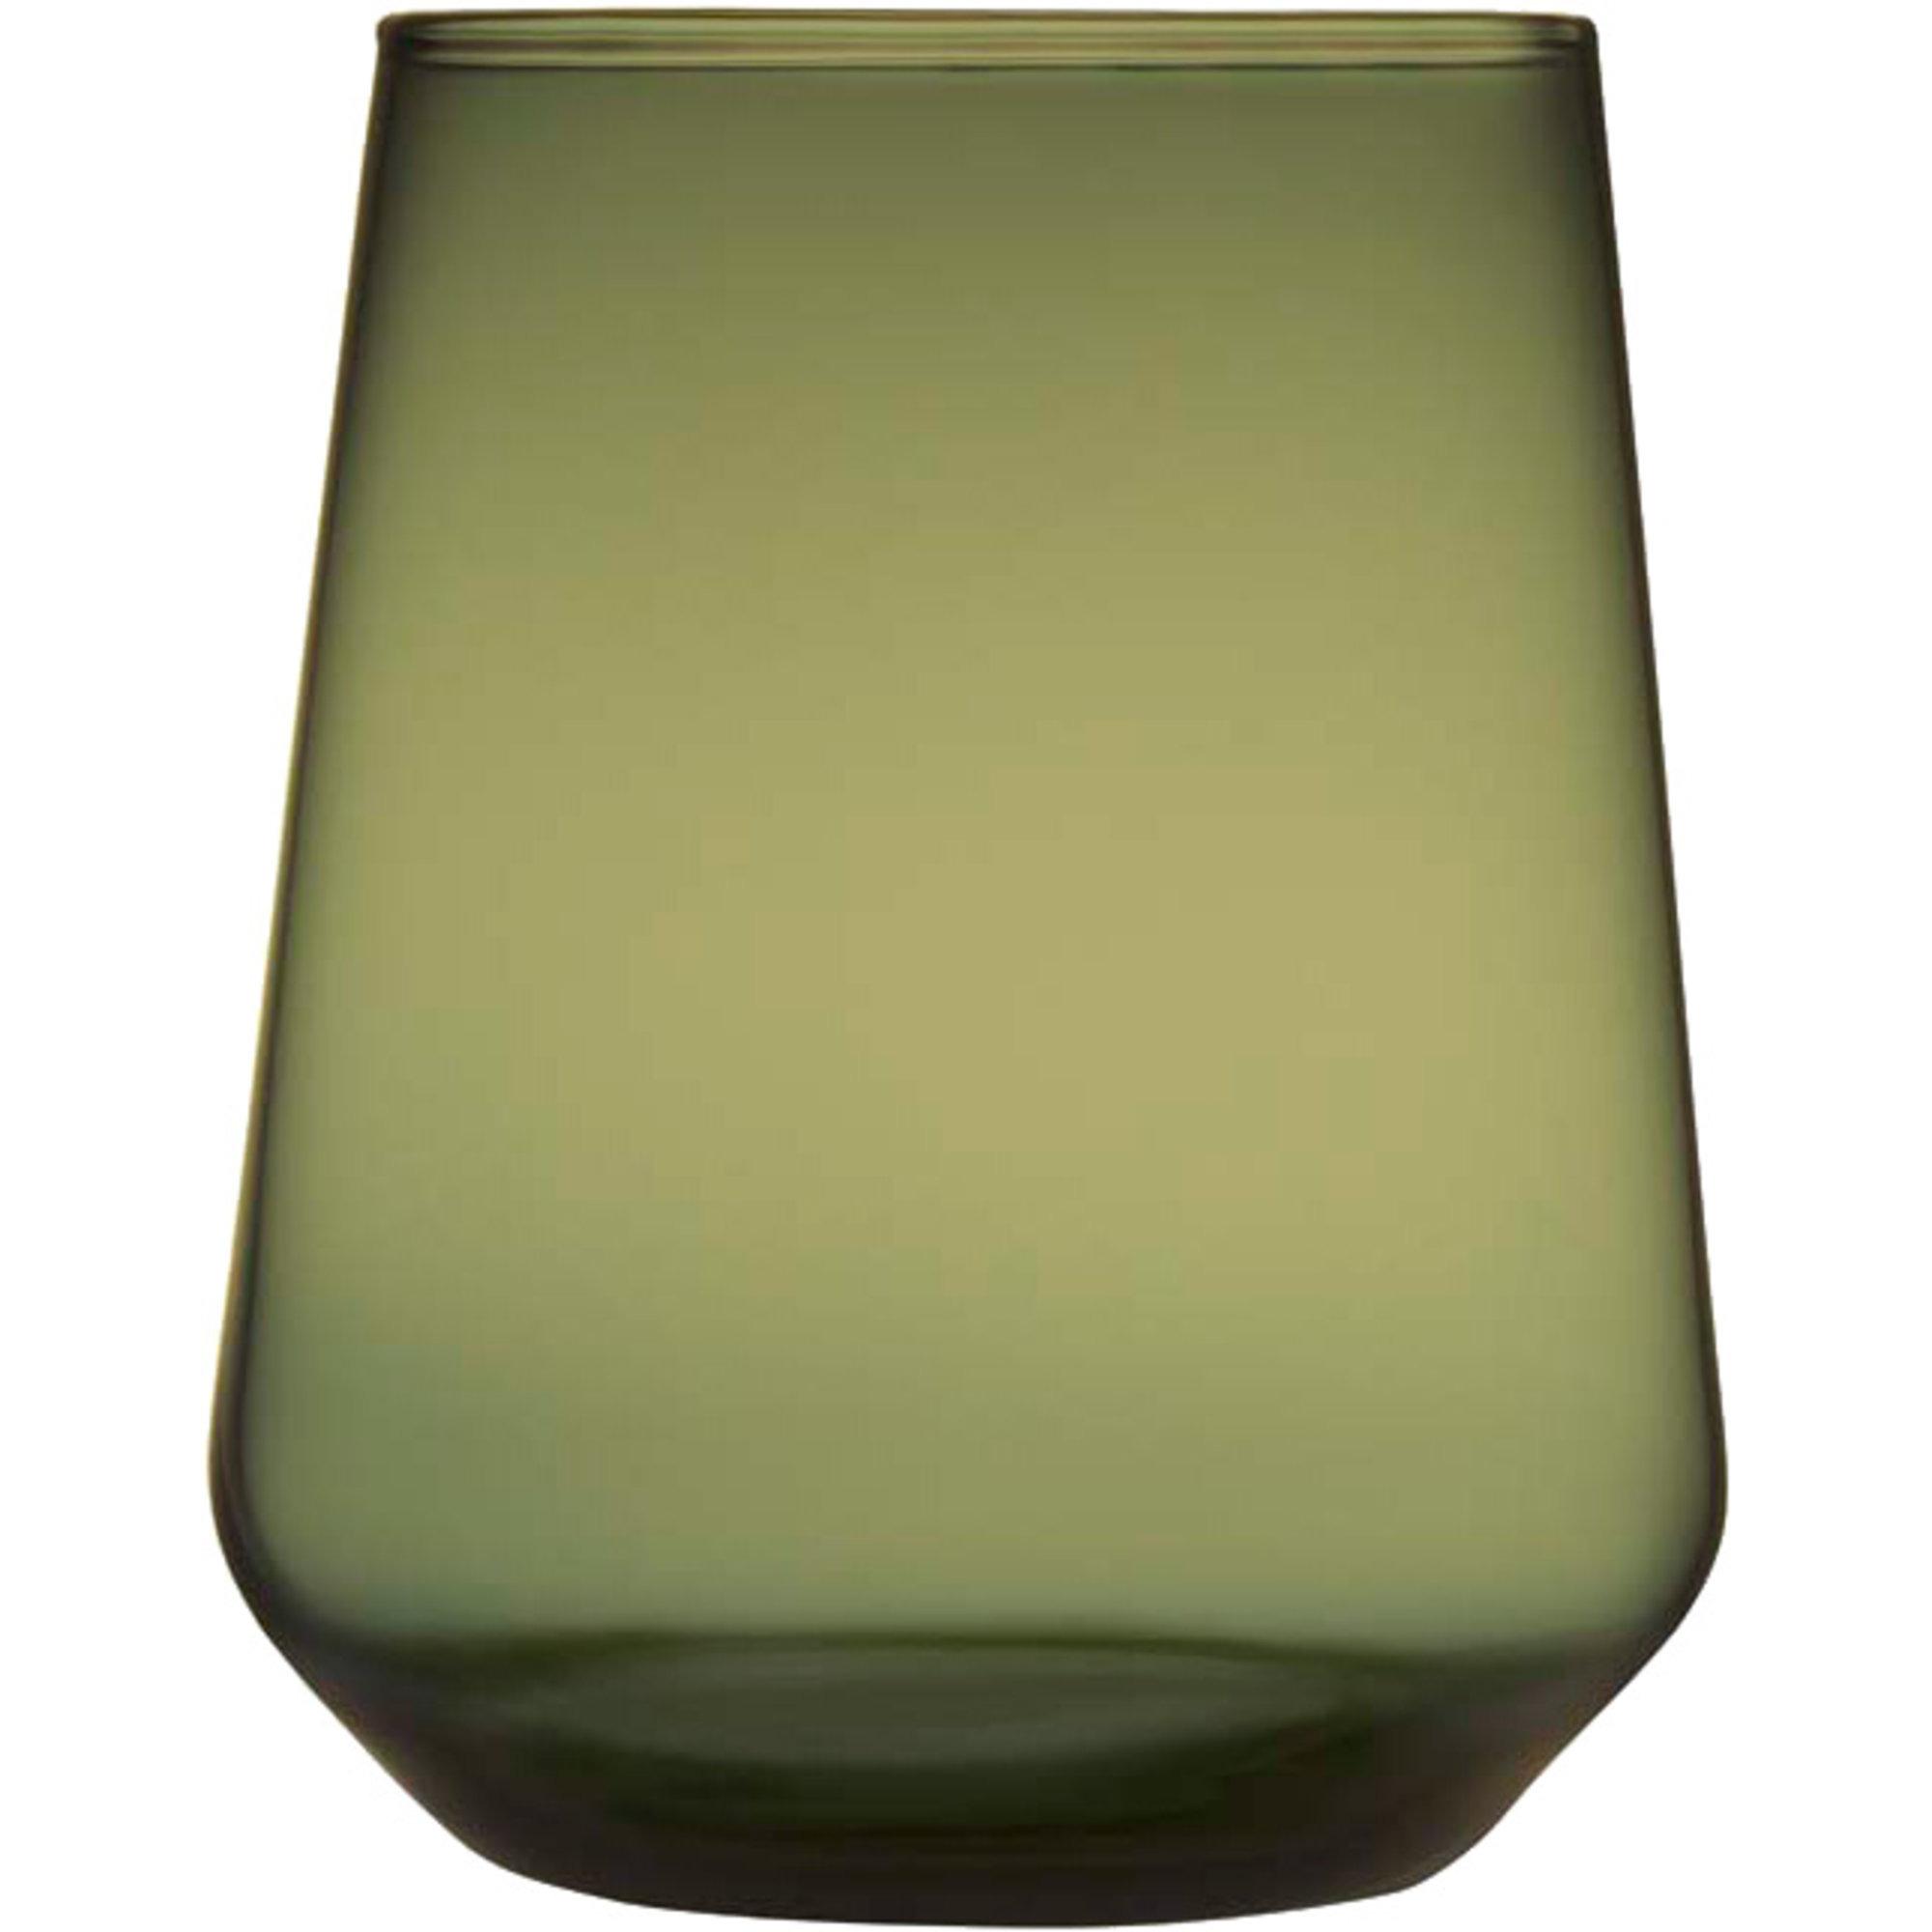 Iittala Essence dricksglas 35 cl mossgrön 2 st